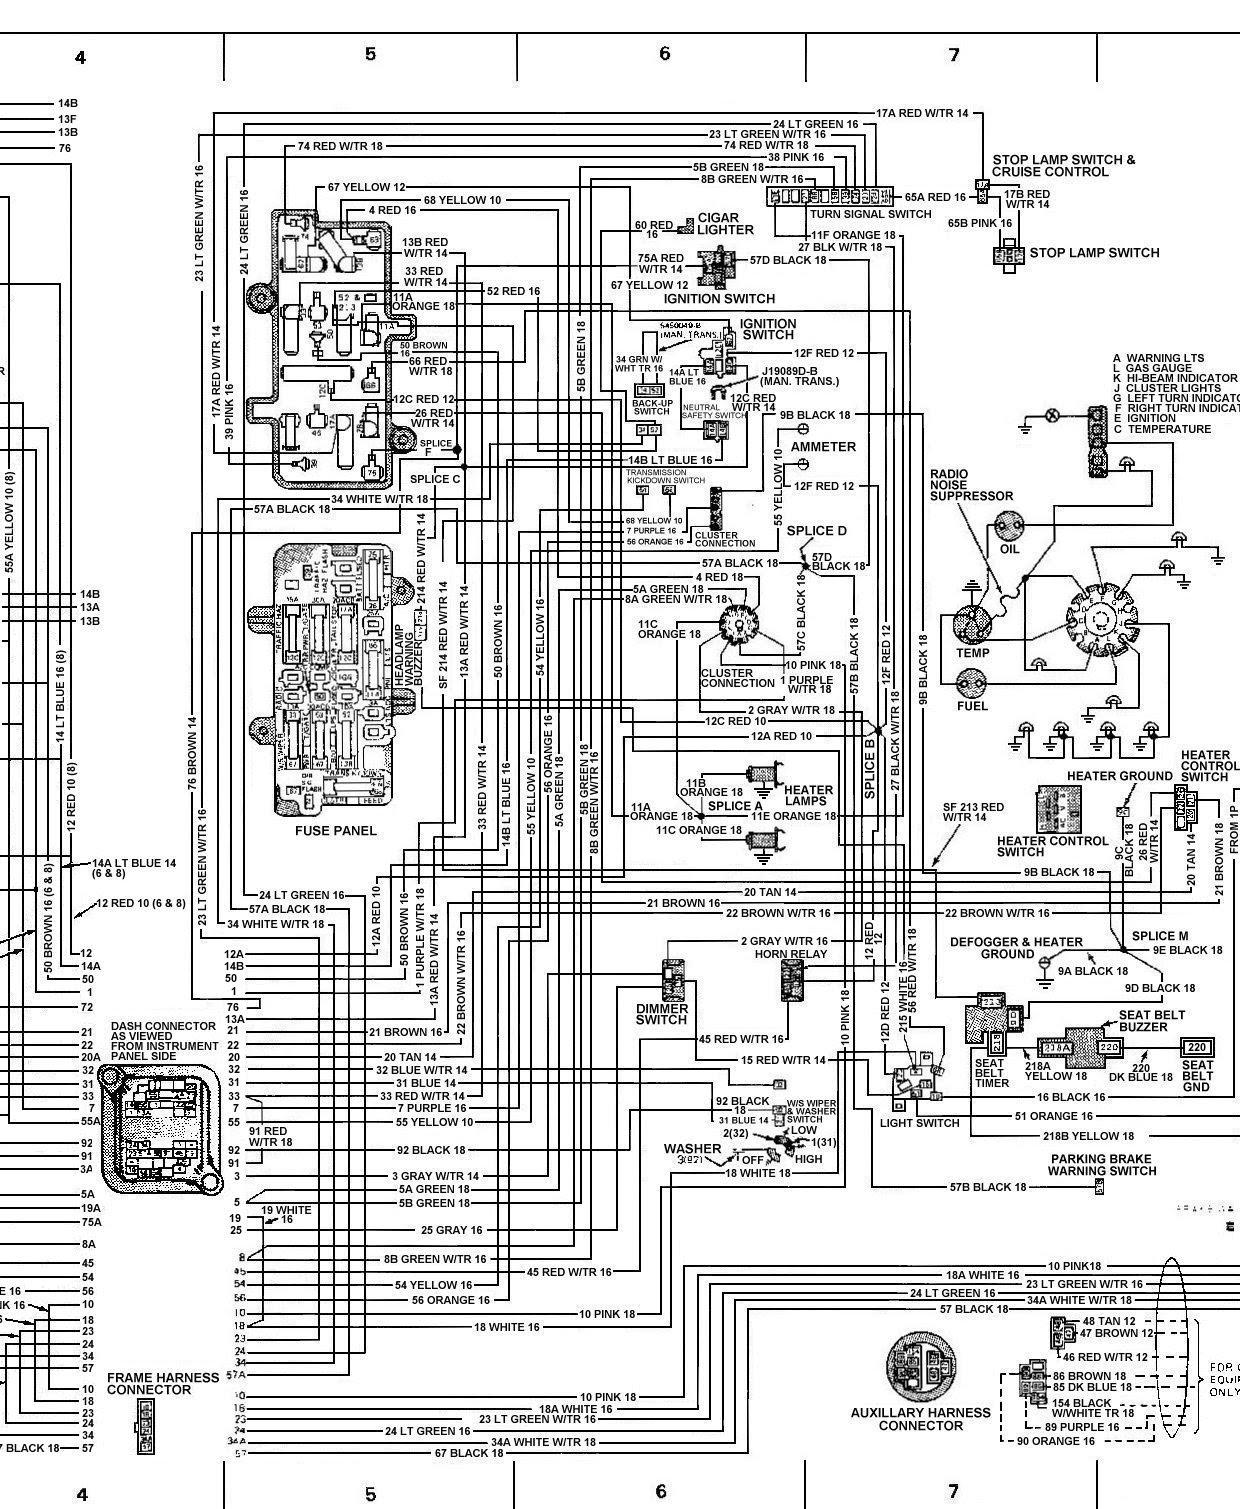 Wiring Diagram For 2004 Dodge Ram 1500   Wiring Diagram - 2004 Dodge Ram 1500 Wiring Diagram